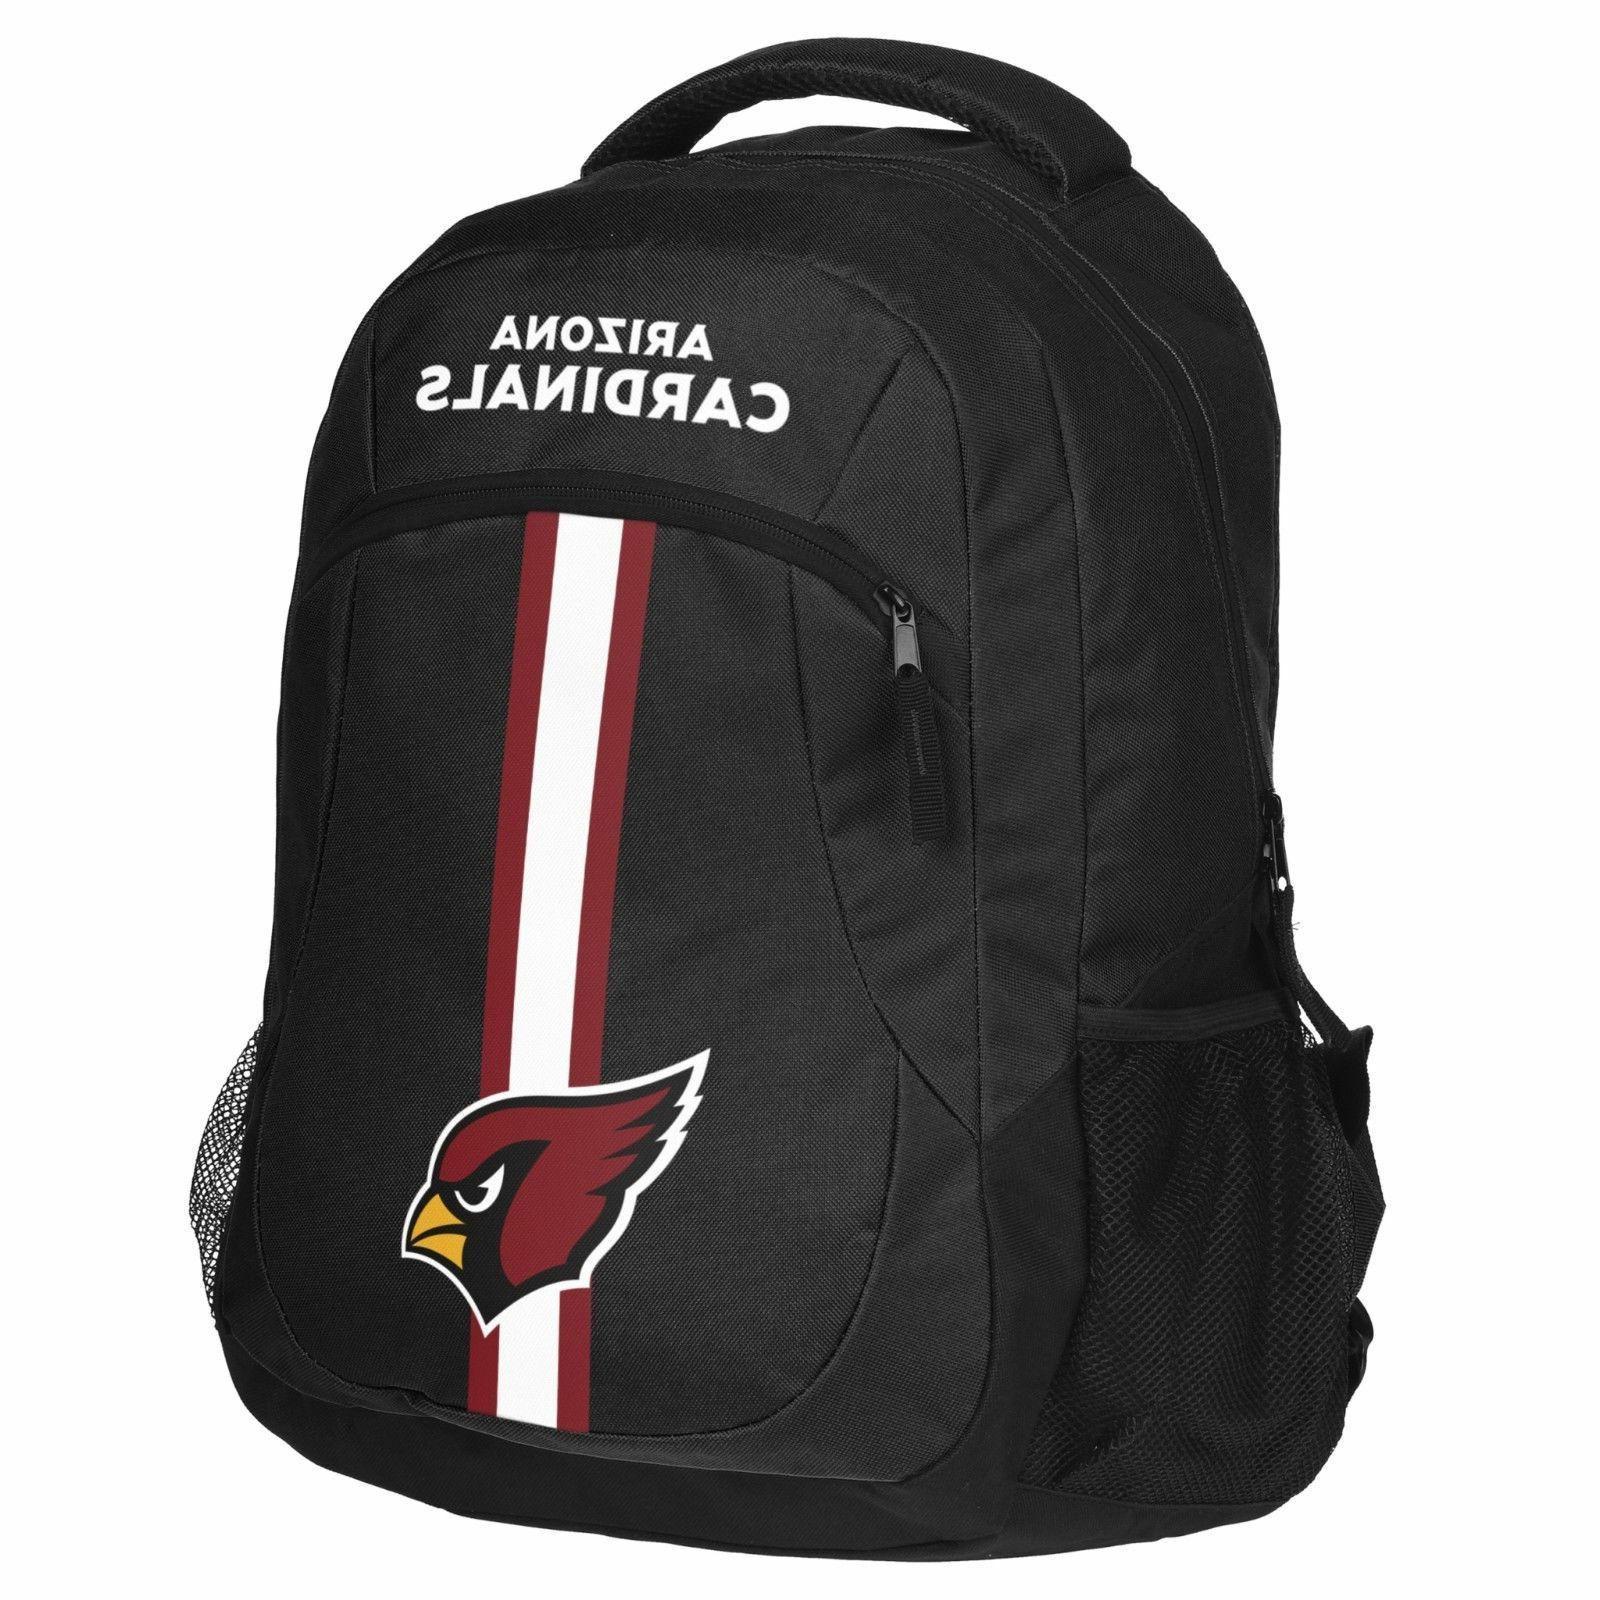 arizona cardinals logo action backpack school bag